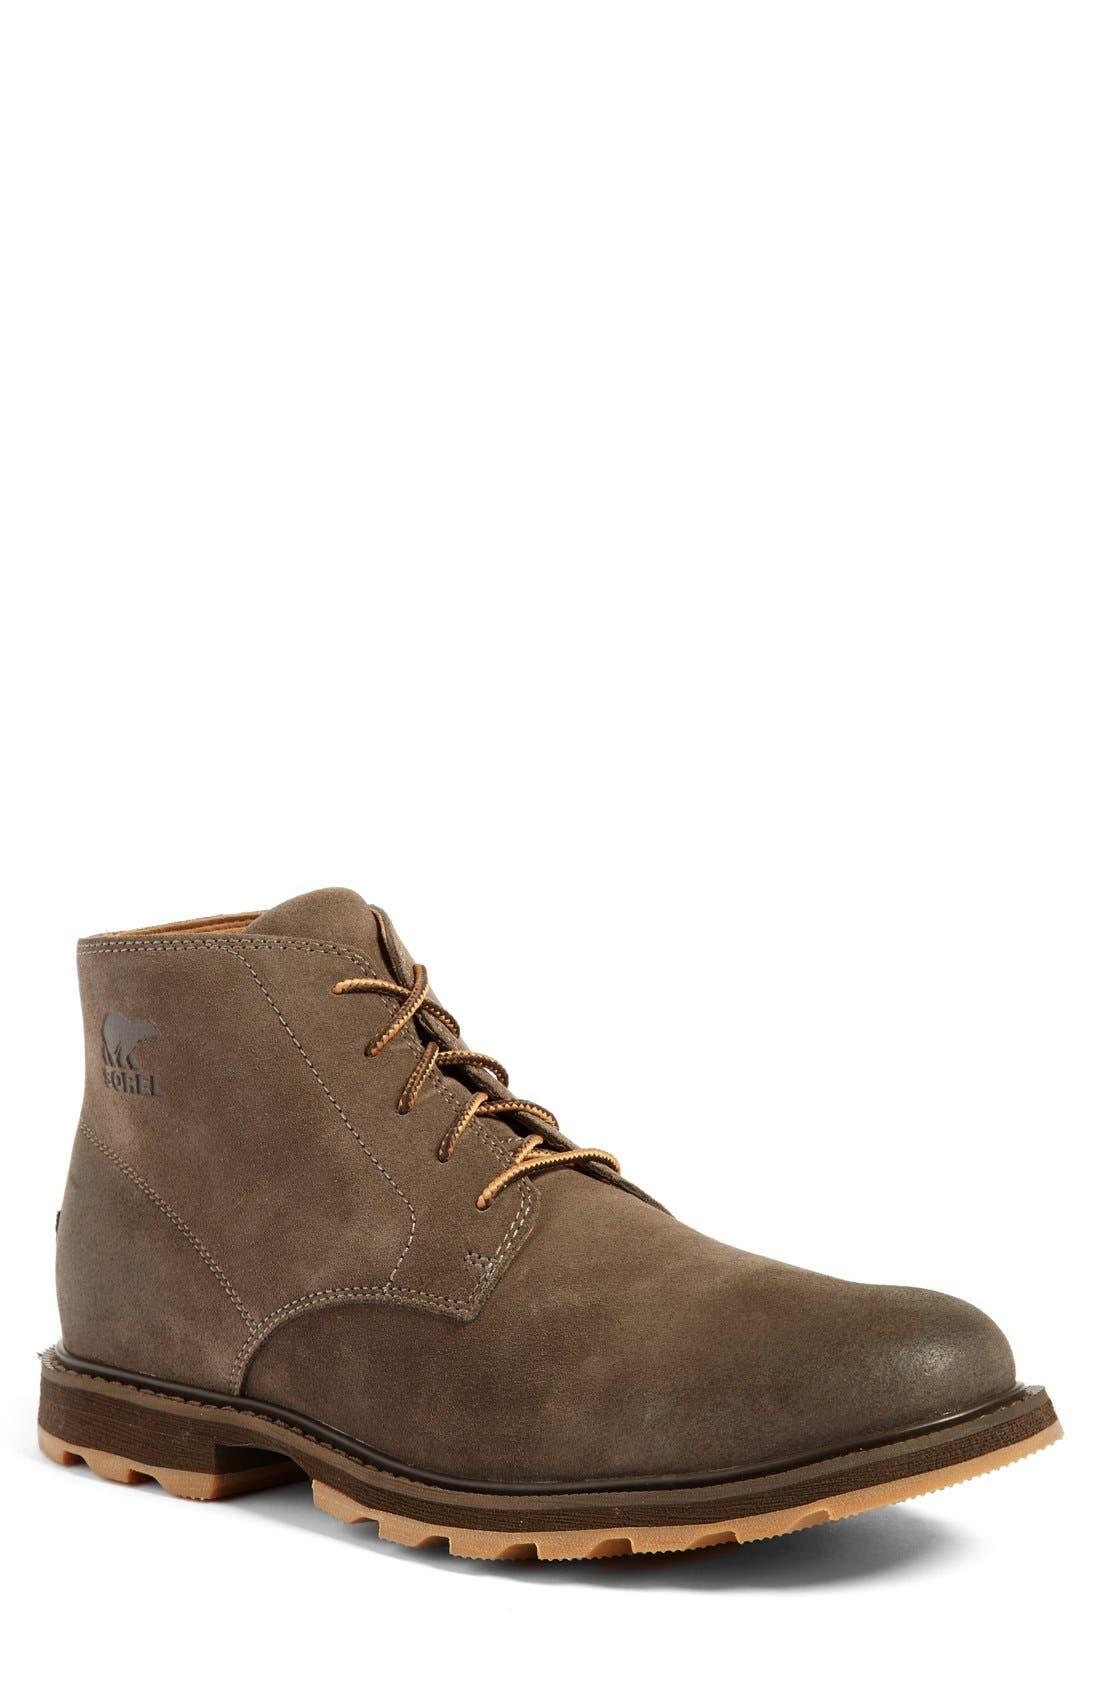 Main Image - Sorel 'Madson' Chukka Boot (Men)